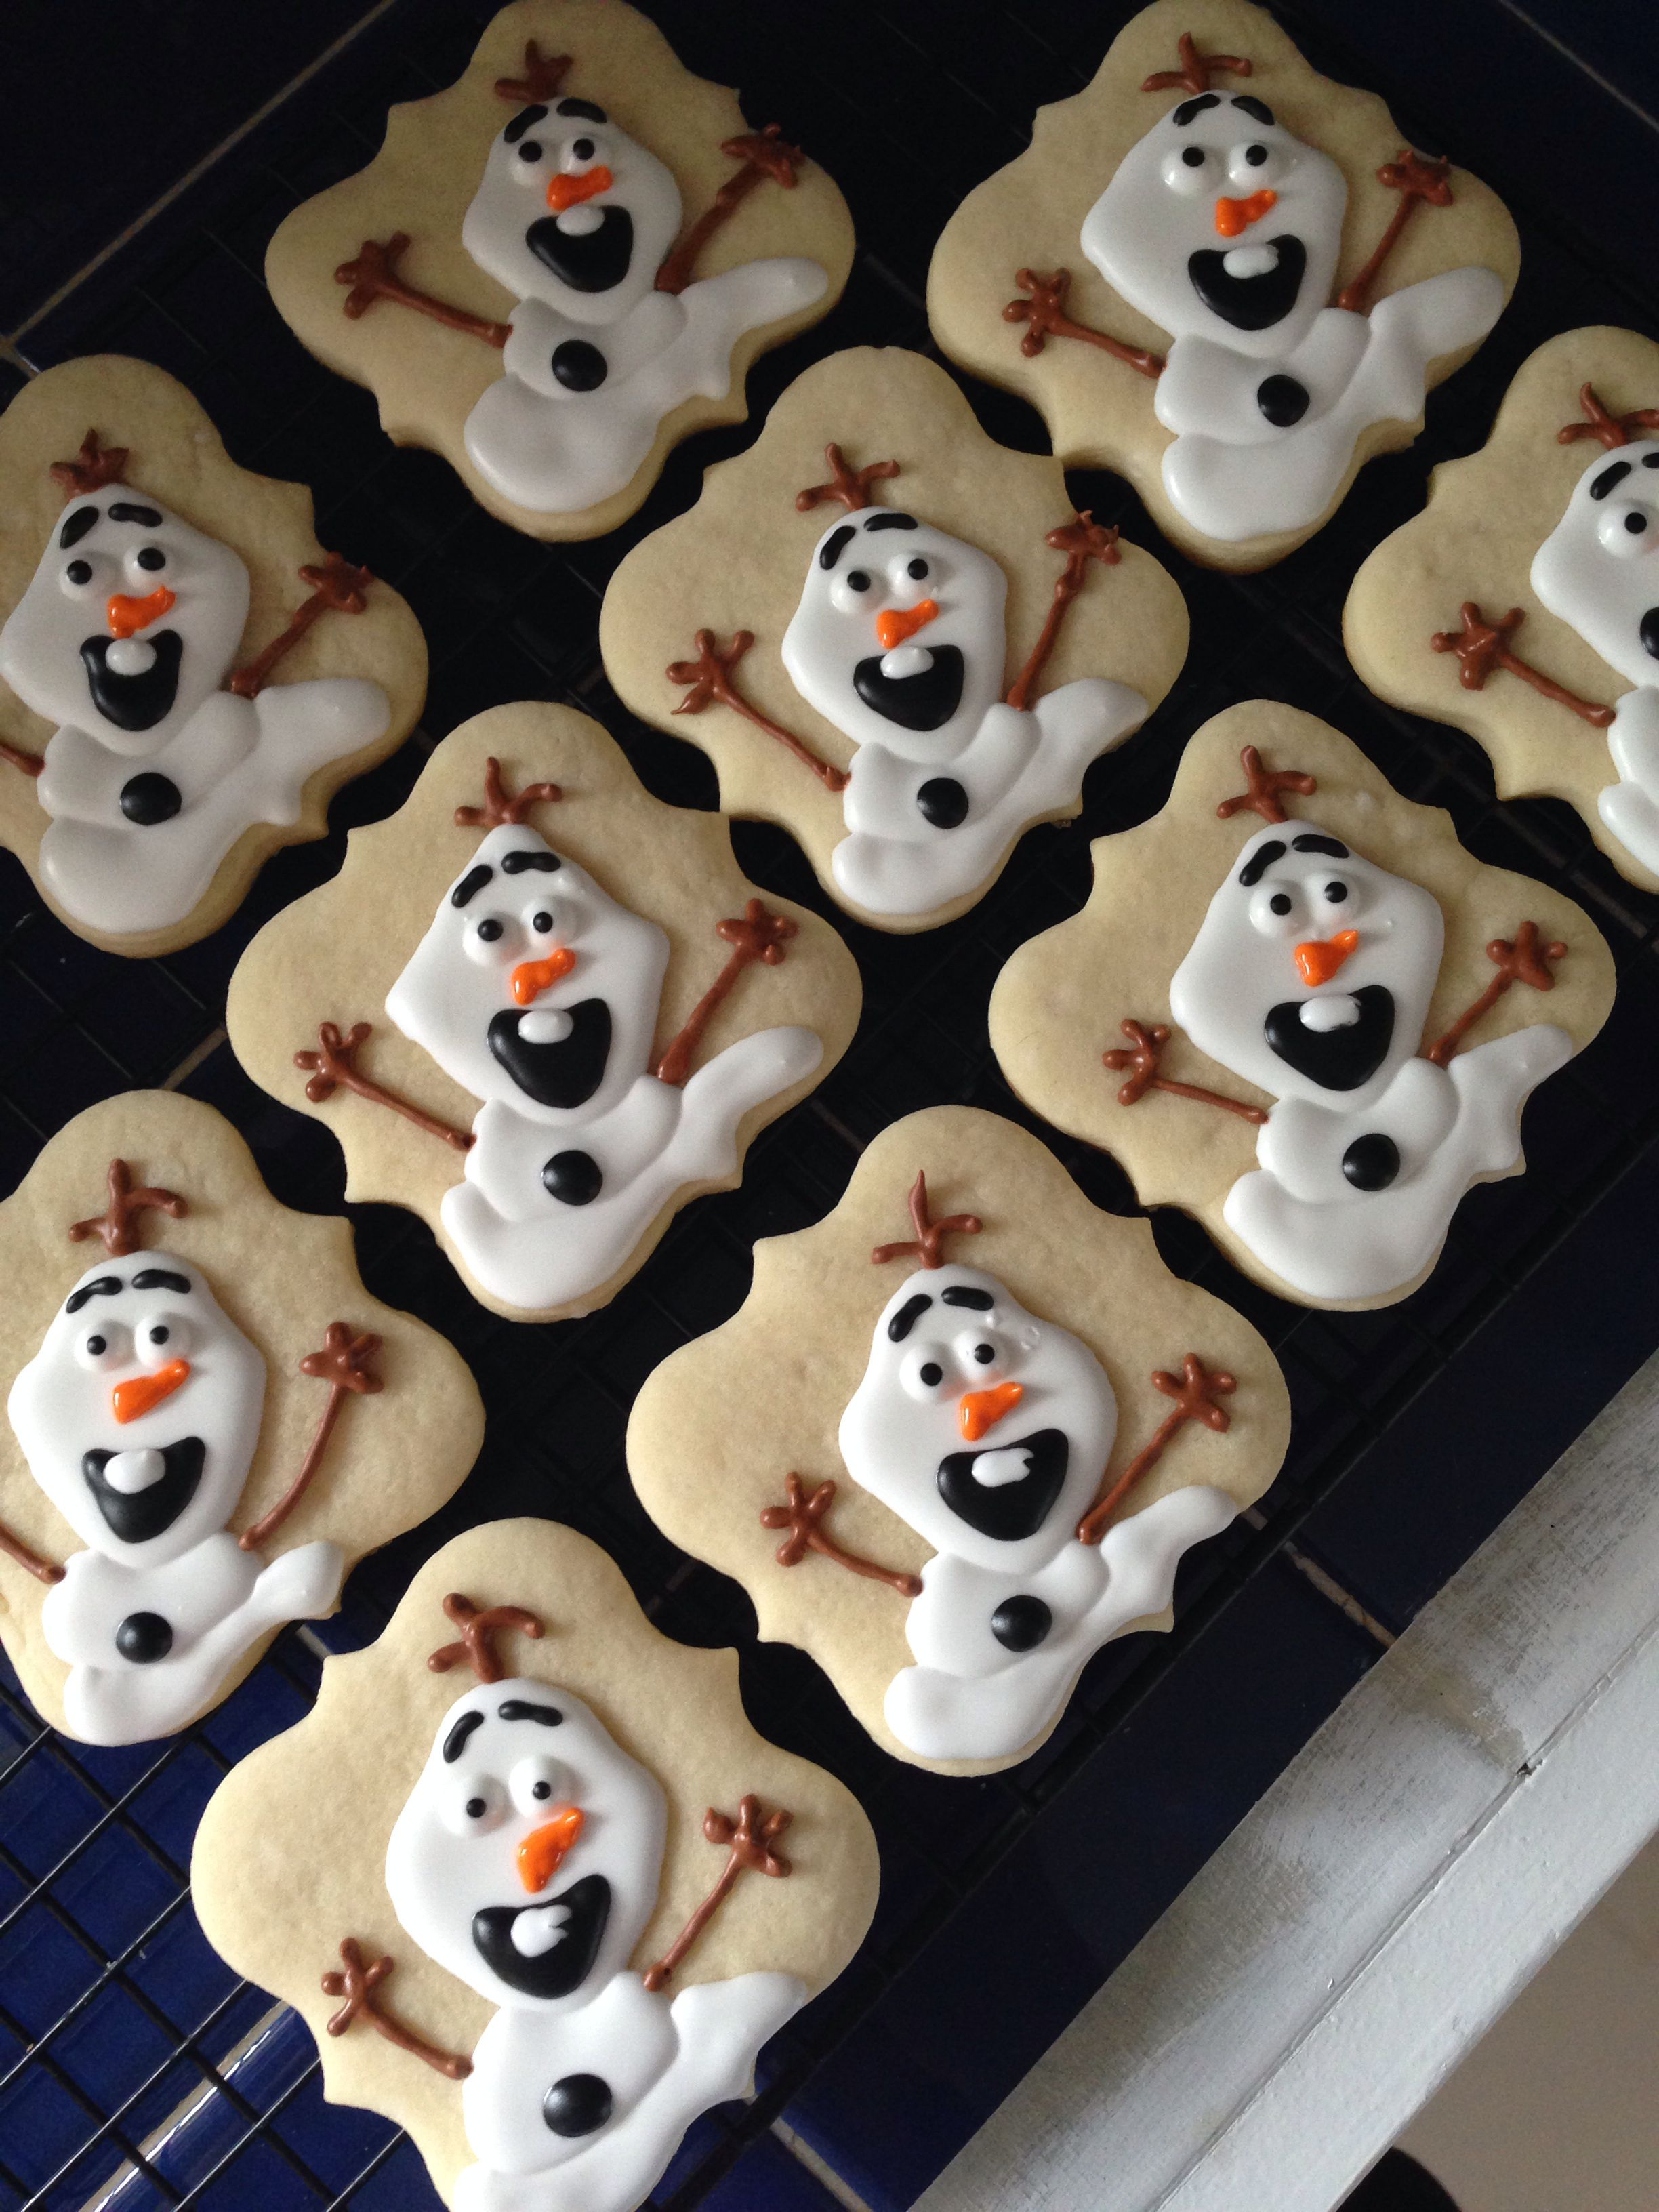 Olaf Sugar Cookies with Royal Icing